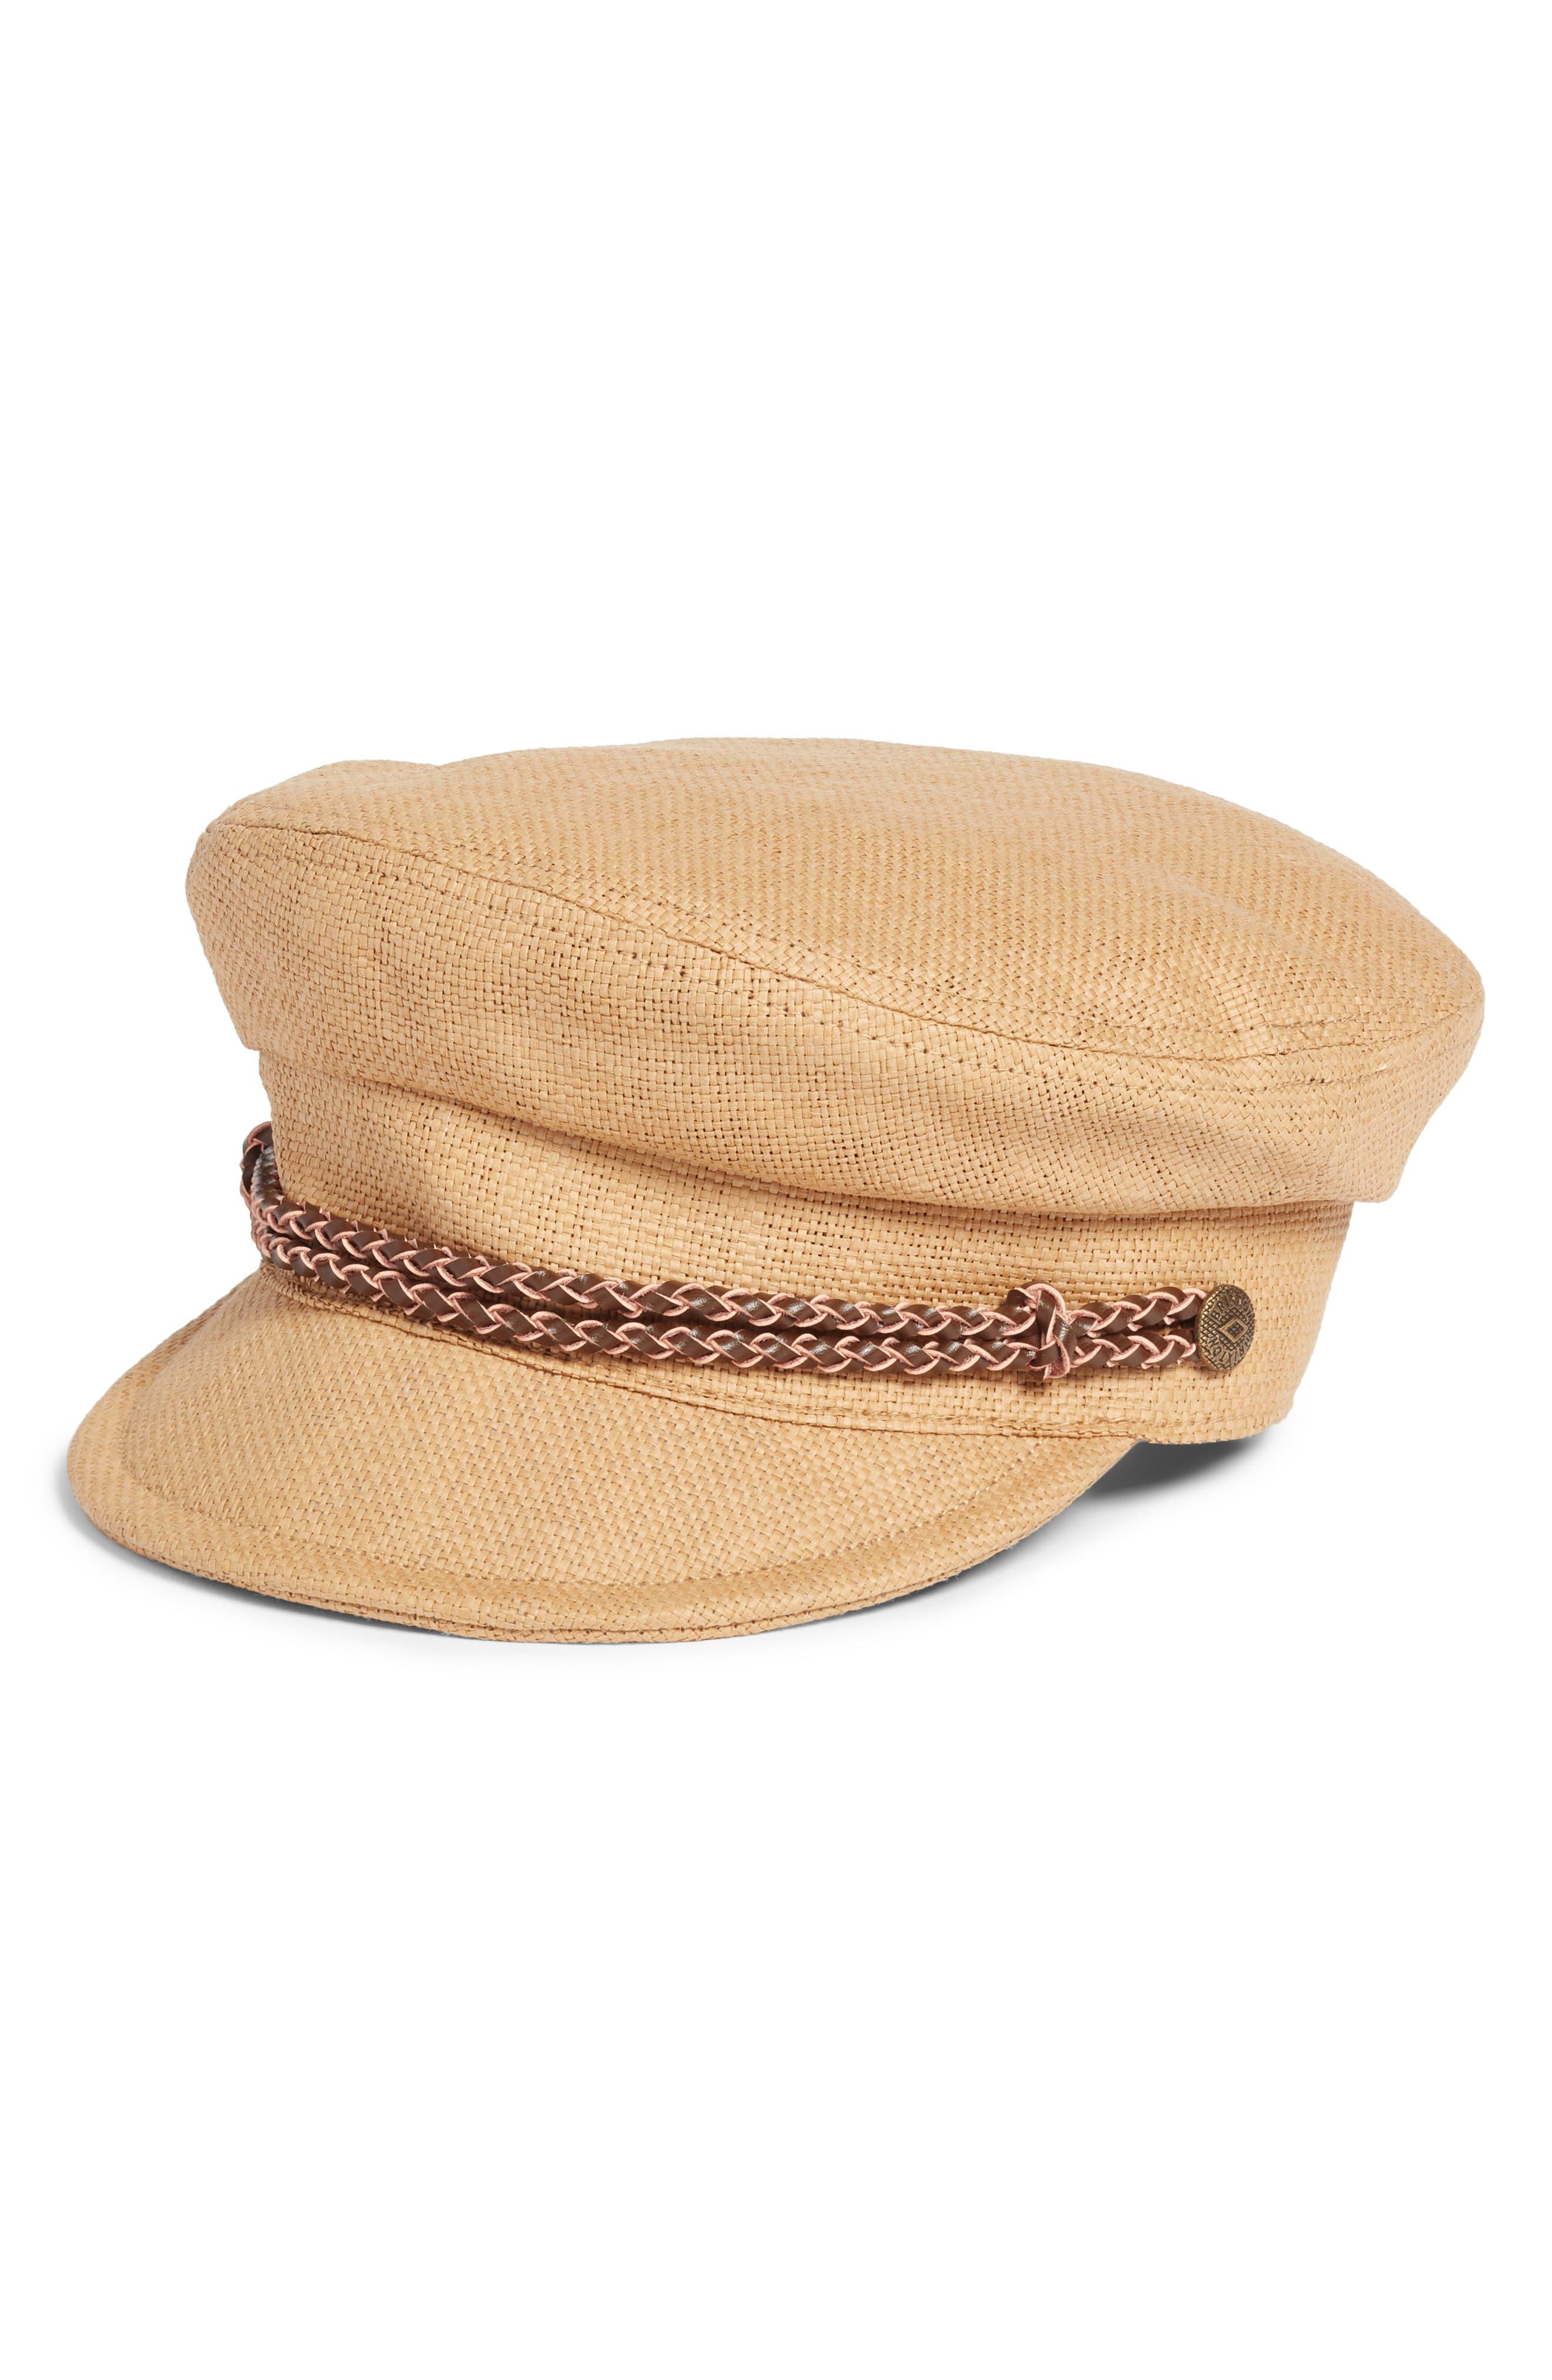 quality design ad7d6 1aa0a Women s Brixton Kayla Straw Baker Boy Cap - Brown